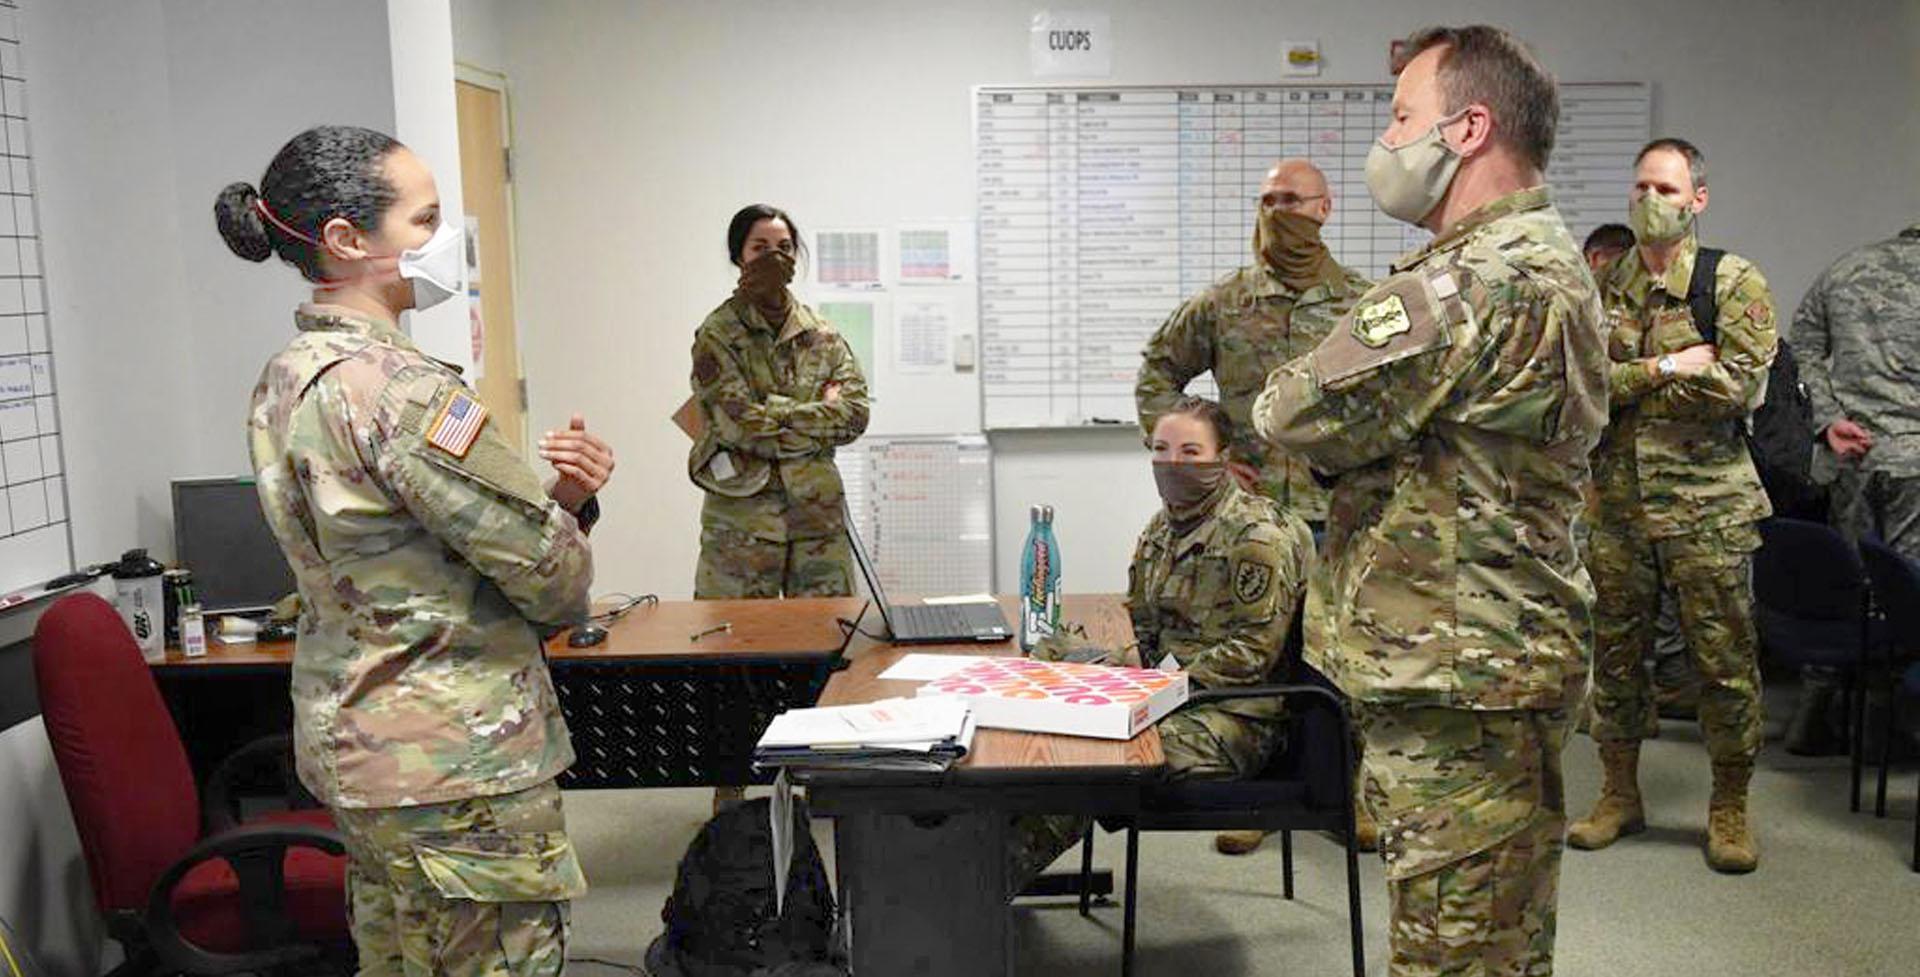 lindsay giguiere, steve januario and rasheeda bilal in action as air national guard members